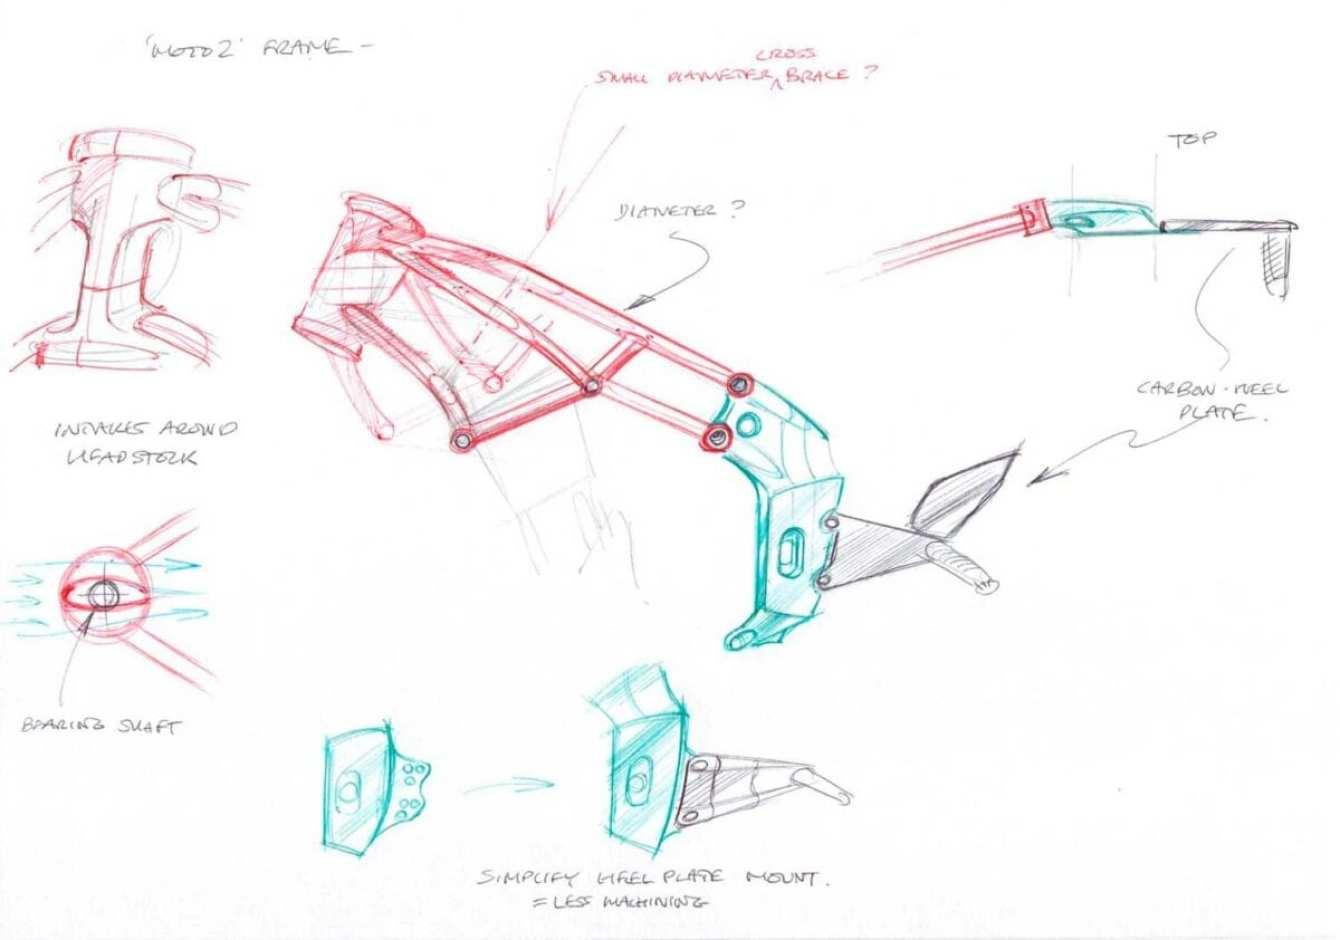 Design-sketches moto 2 road bike